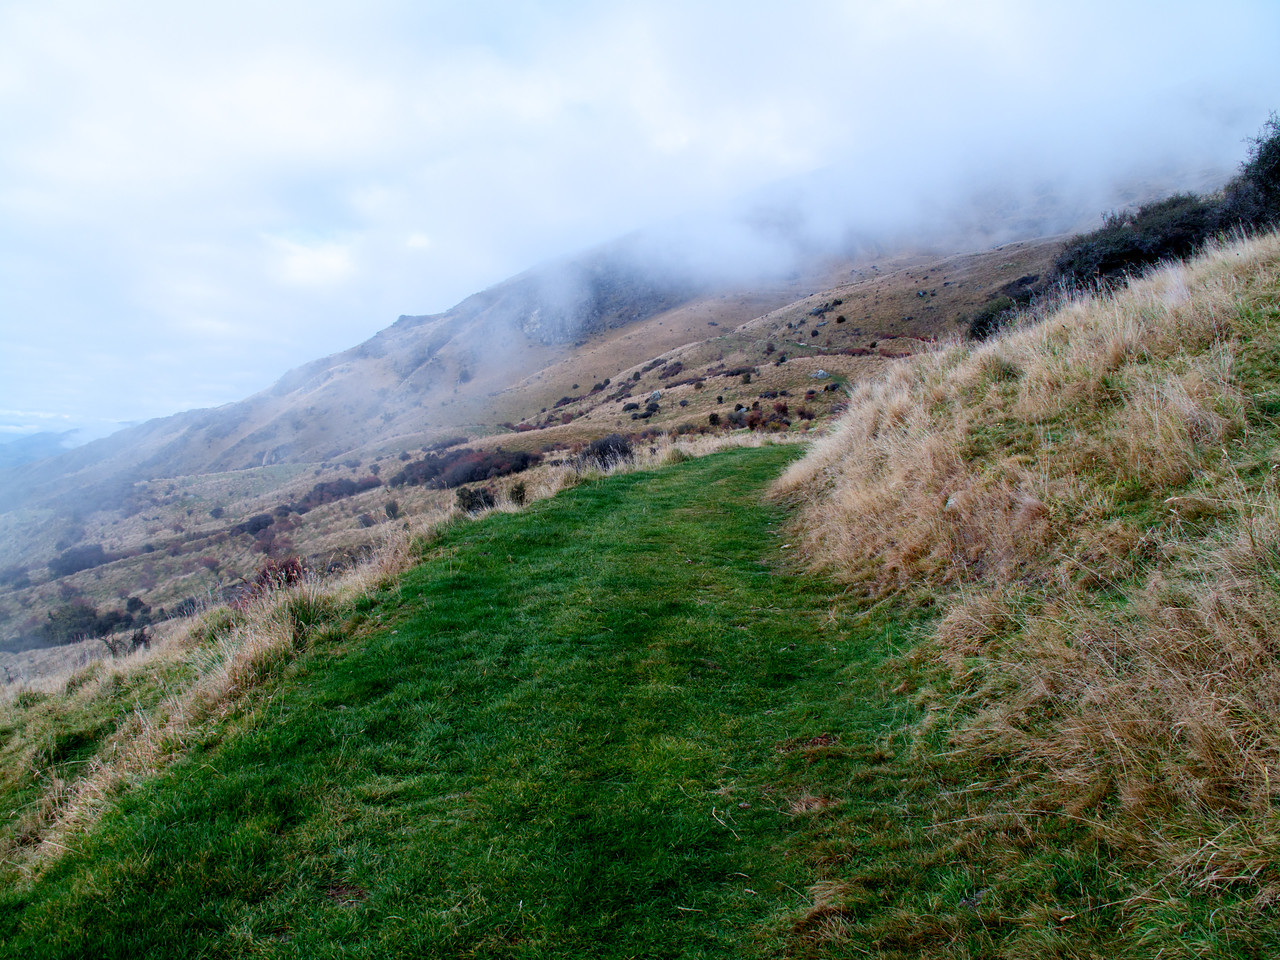 More easy grassy climbing on Roys Peak Track